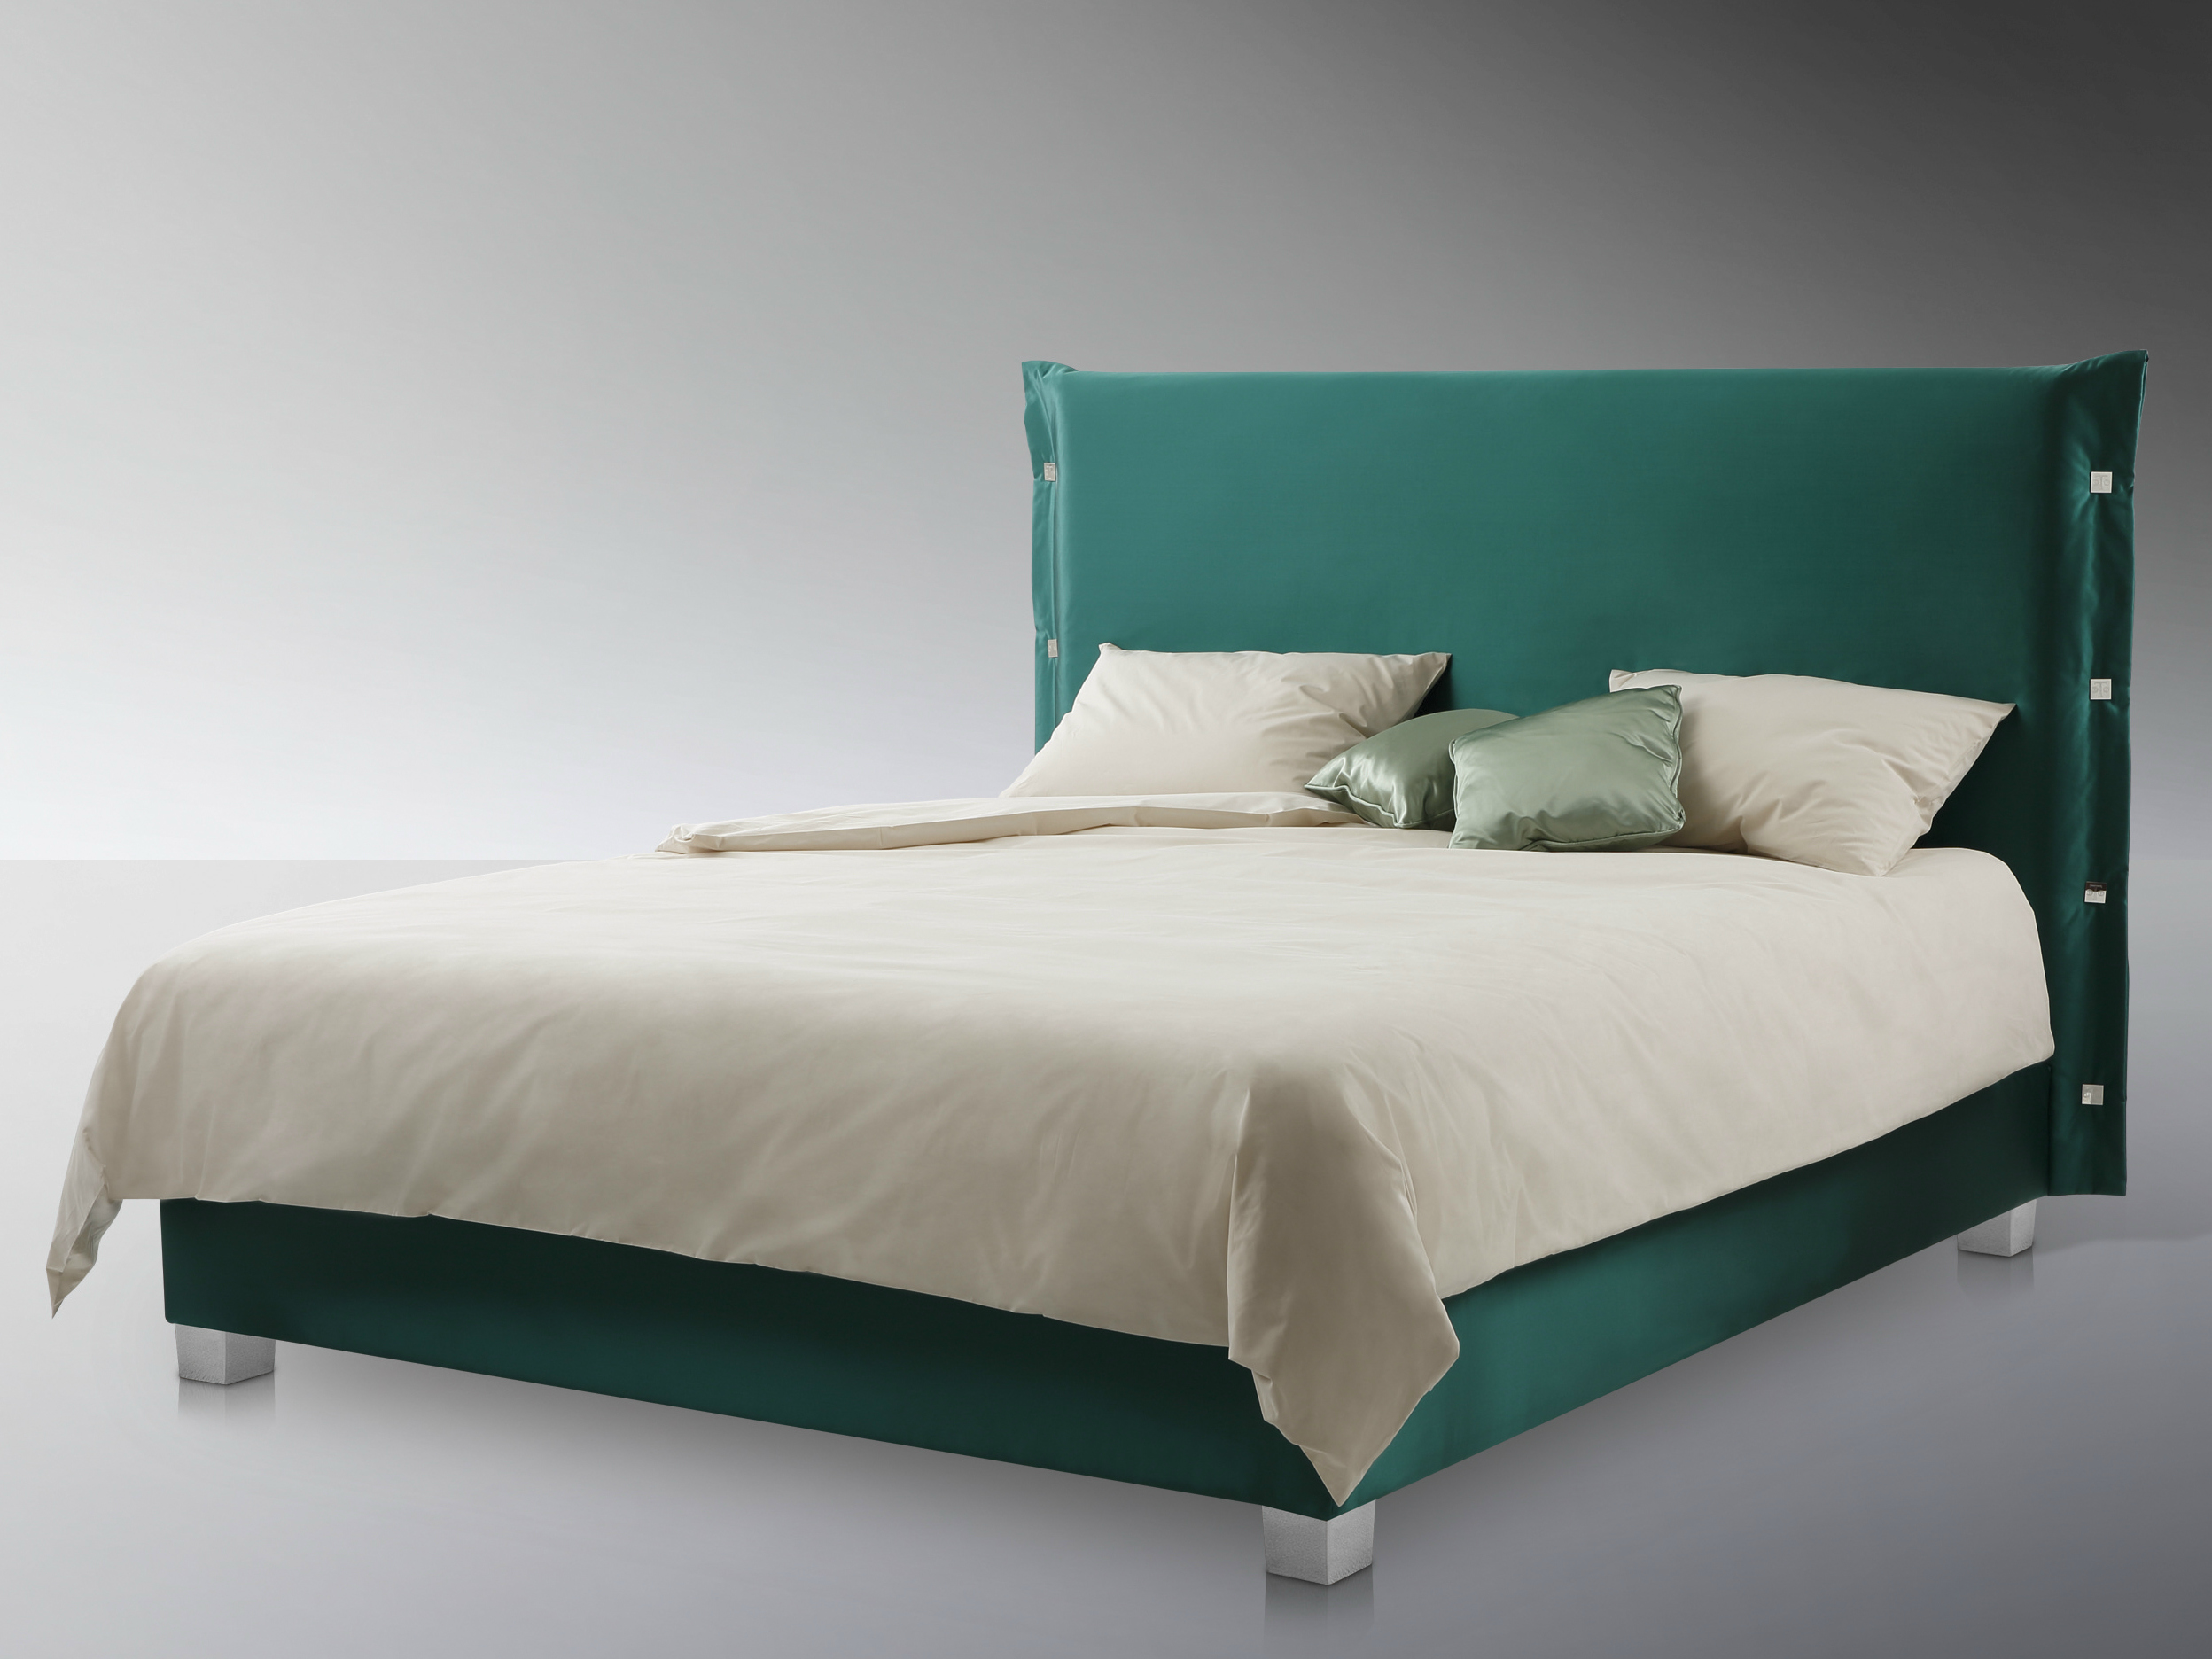 tete lit haute. Black Bedroom Furniture Sets. Home Design Ideas